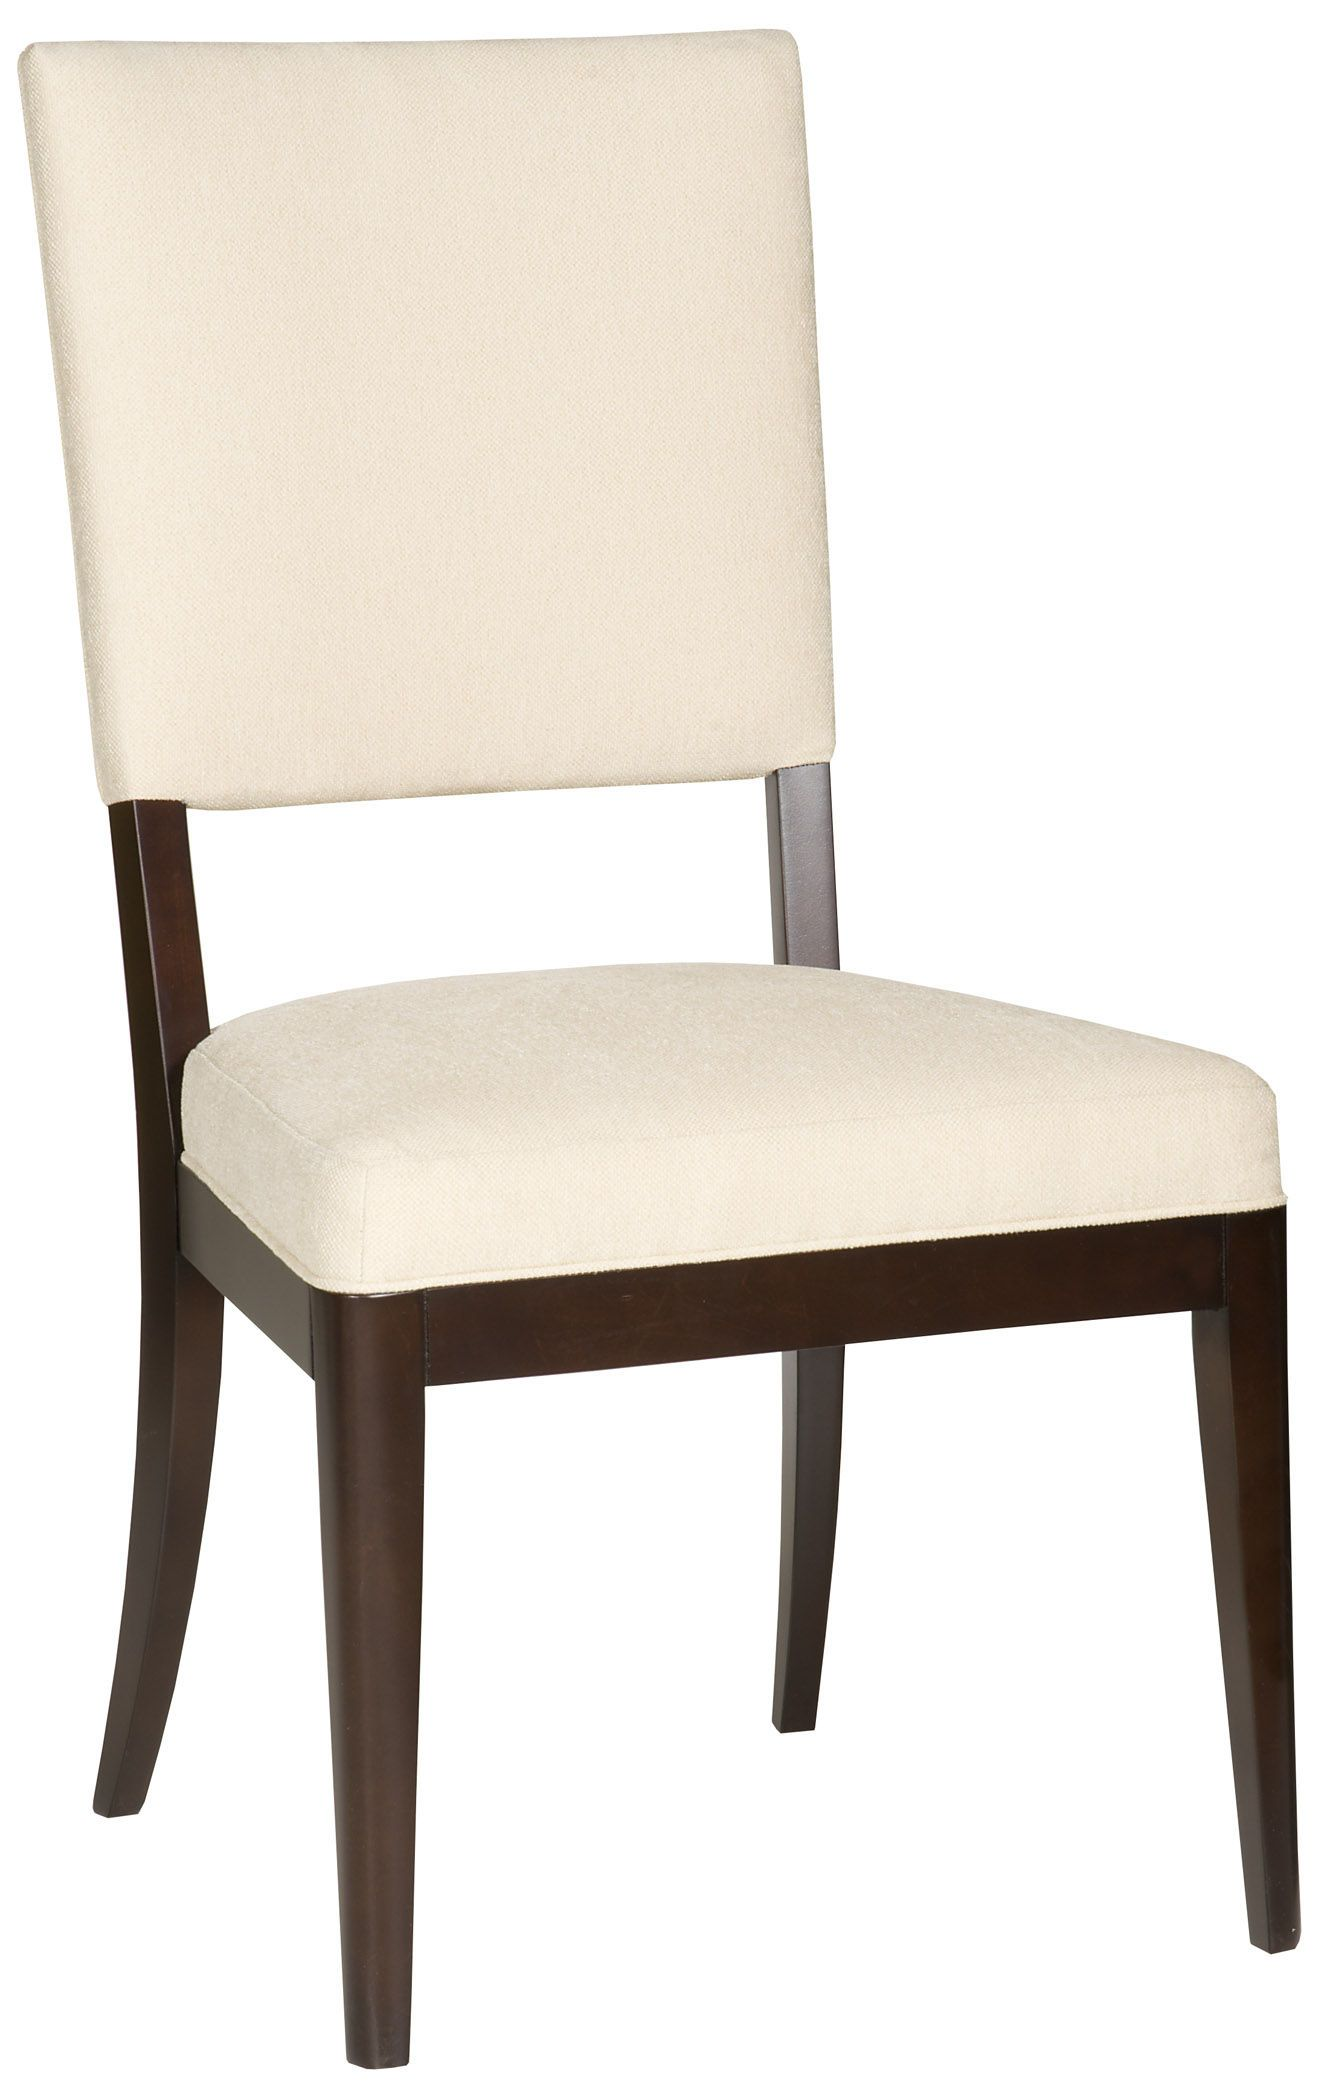 Vanguard Dining Room Juliet Side Chair V12-CH - Vanguard Furniture - Conover, NC